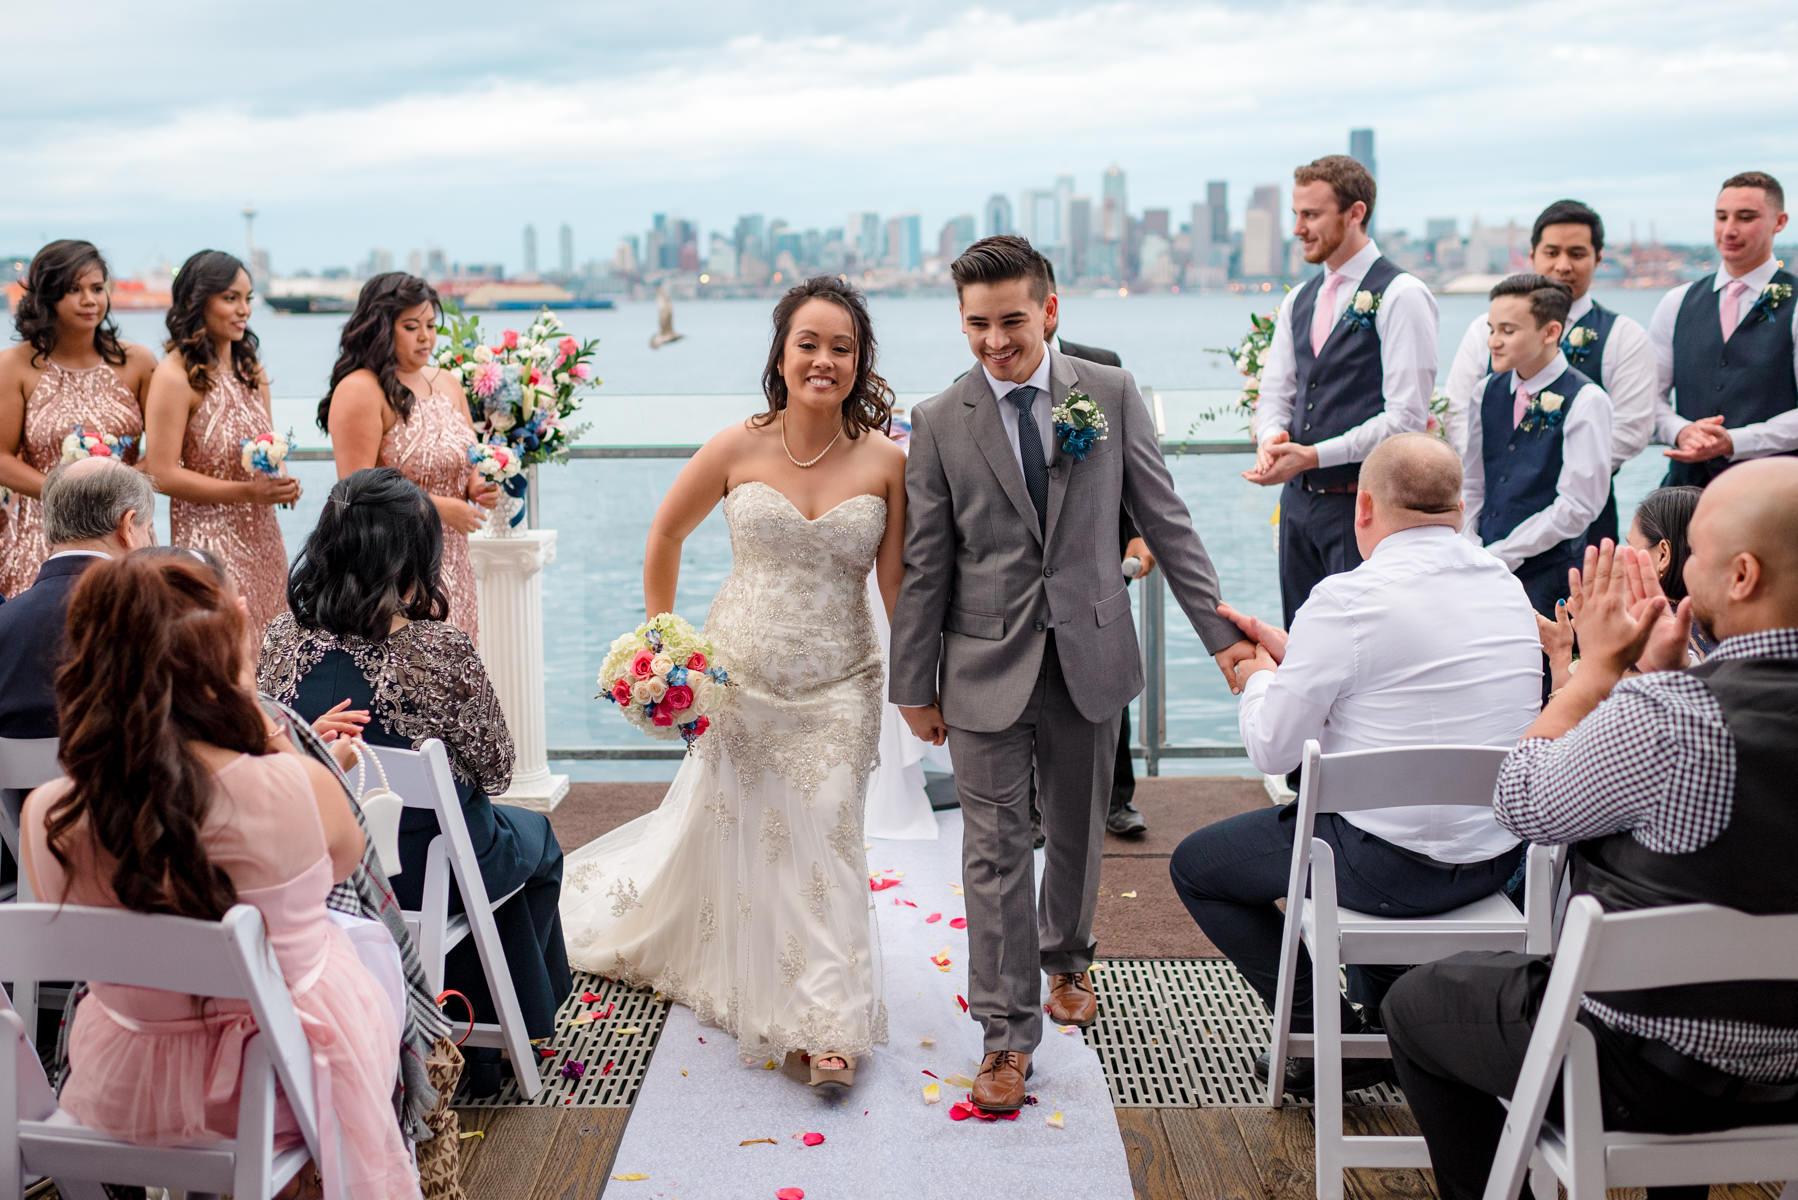 Andrew Tat - Documentary Wedding Photography - Salty's - Seattle, Washington -Mark & Marcy - 18.jpg